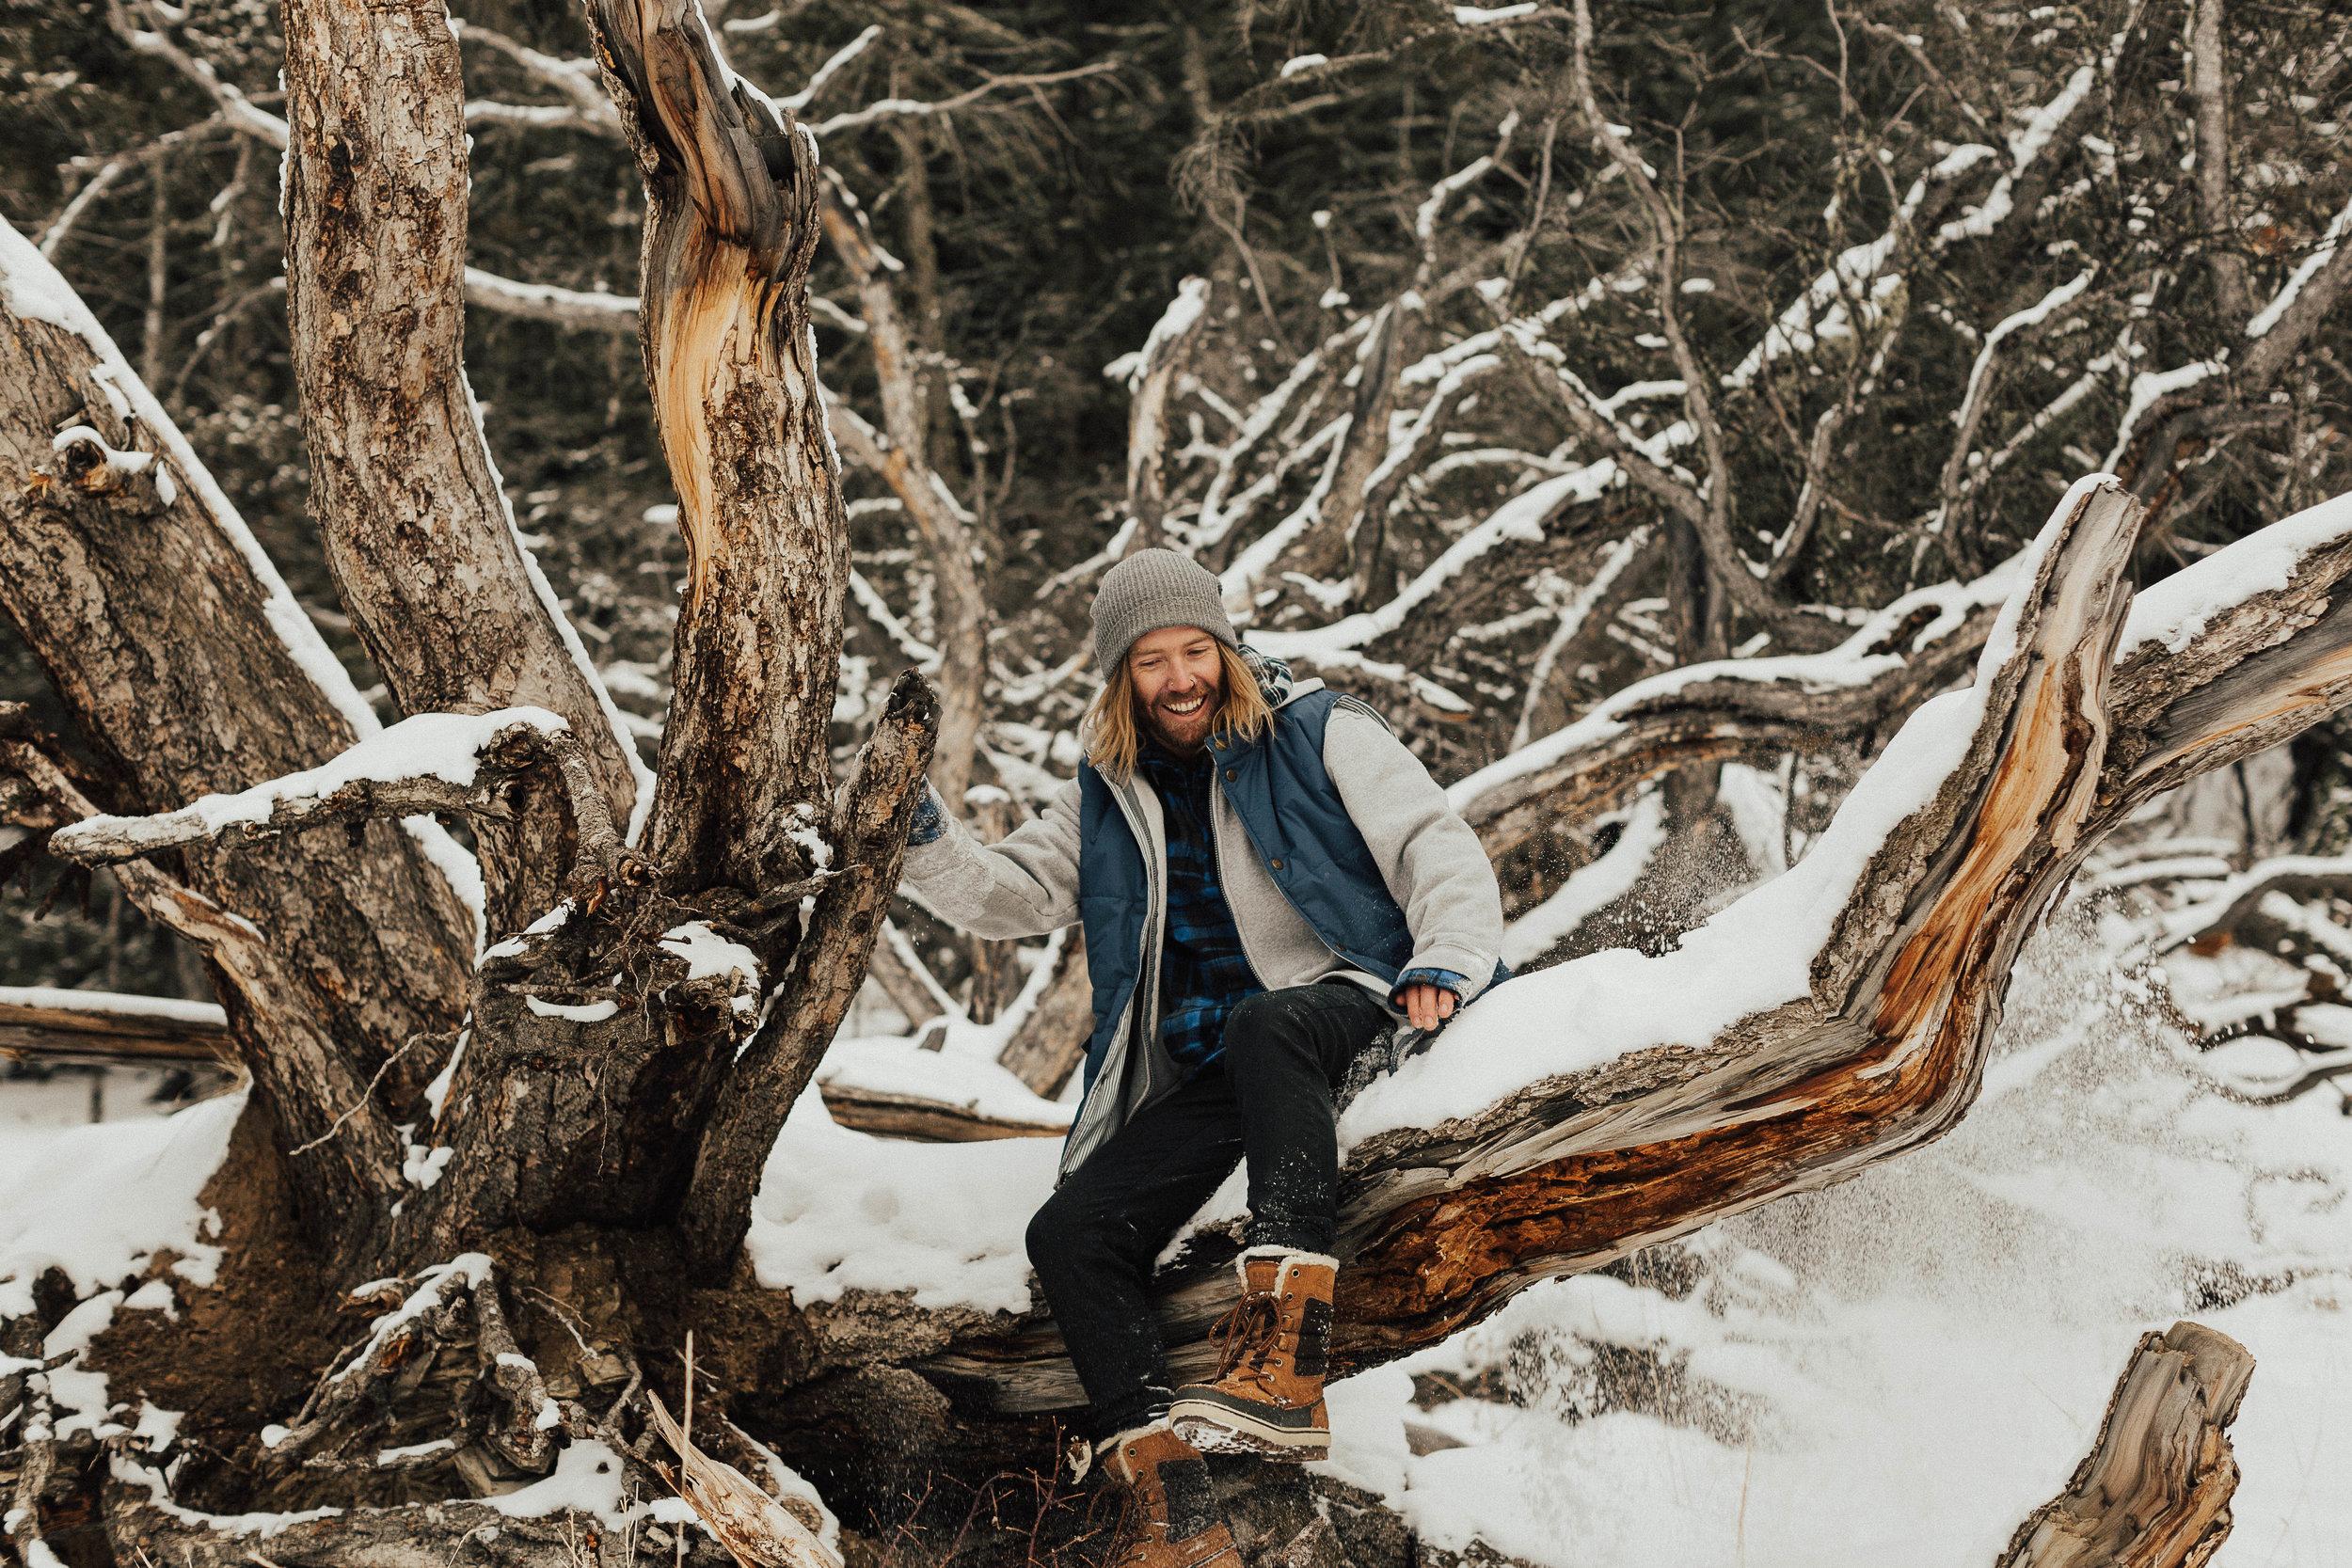 Banff Engagement Photographer - Winter Mountain Adventure Engagement Session - Michelle Larmand Photography-071